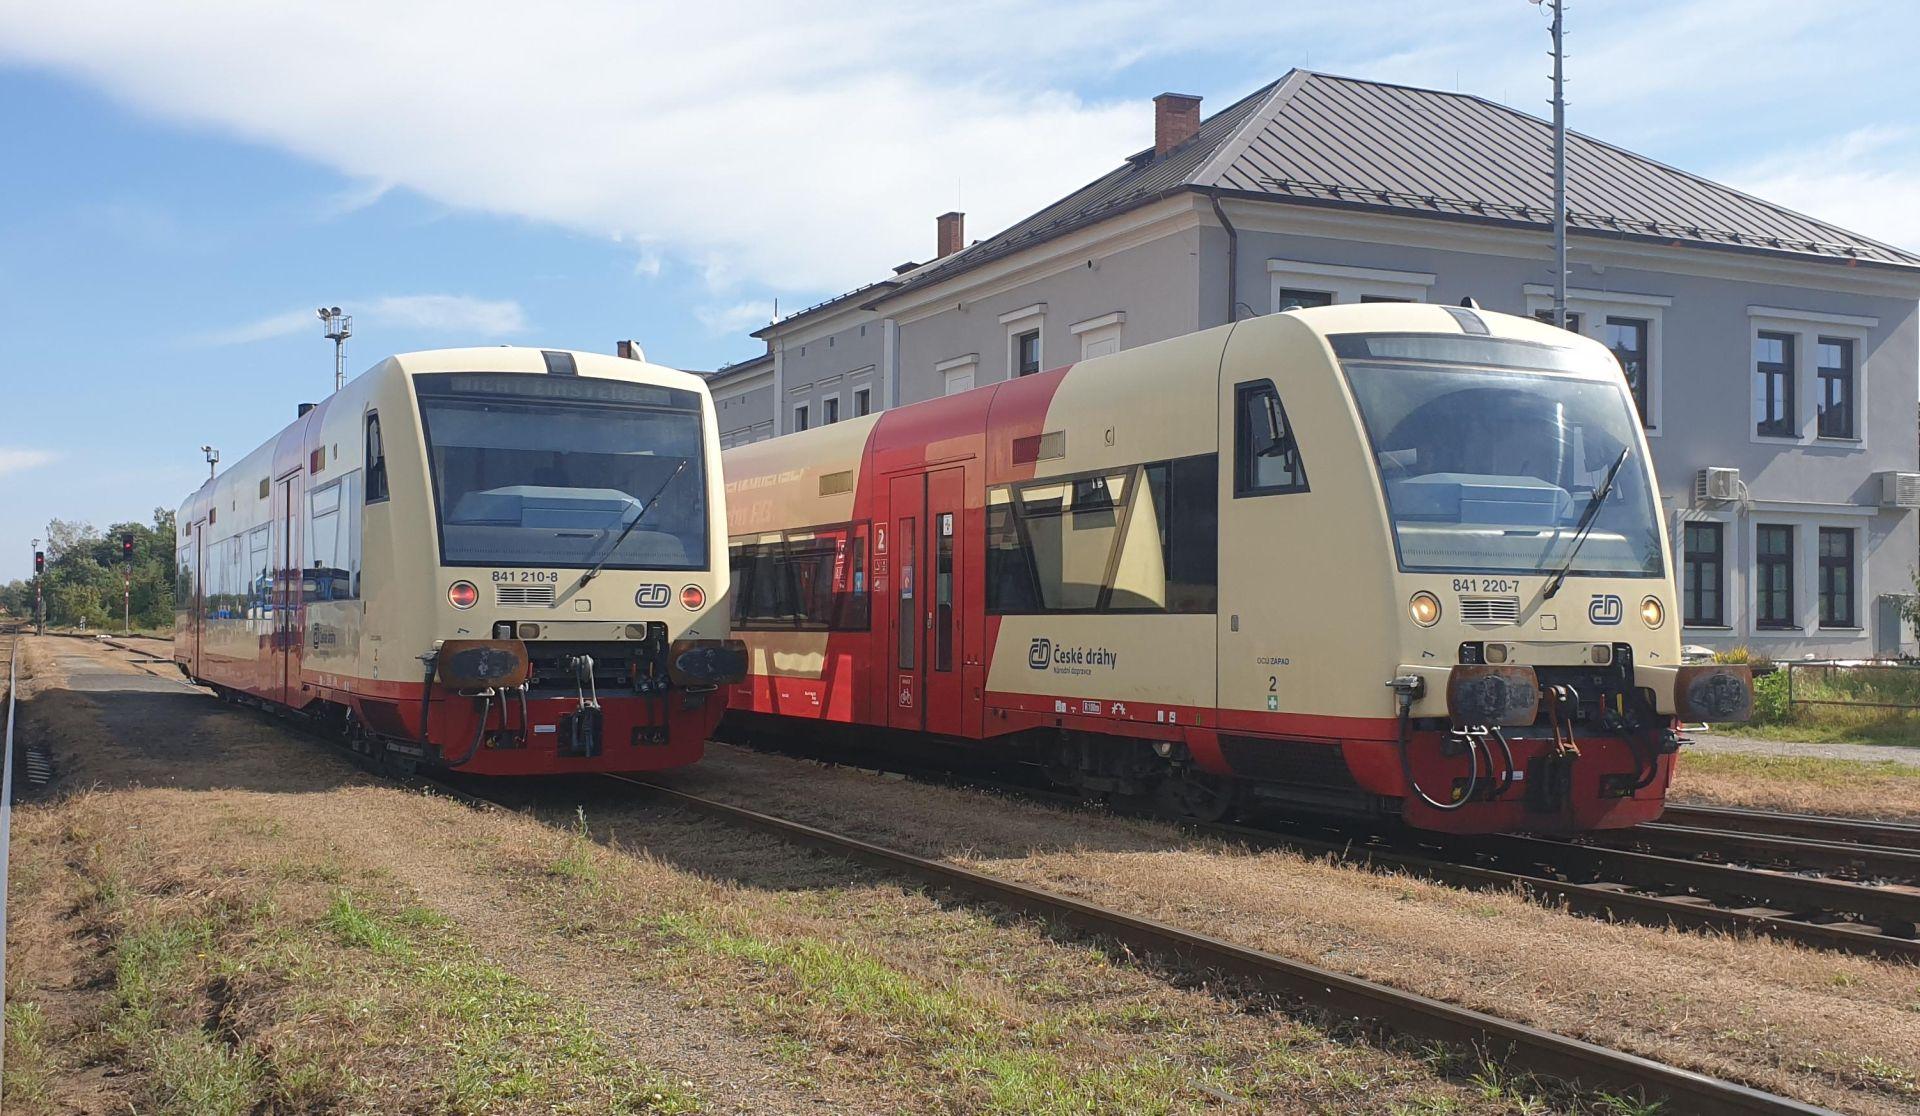 Vozy řady 841.2 Stadler RegioShuttle RS1. Pramen: České dráhy